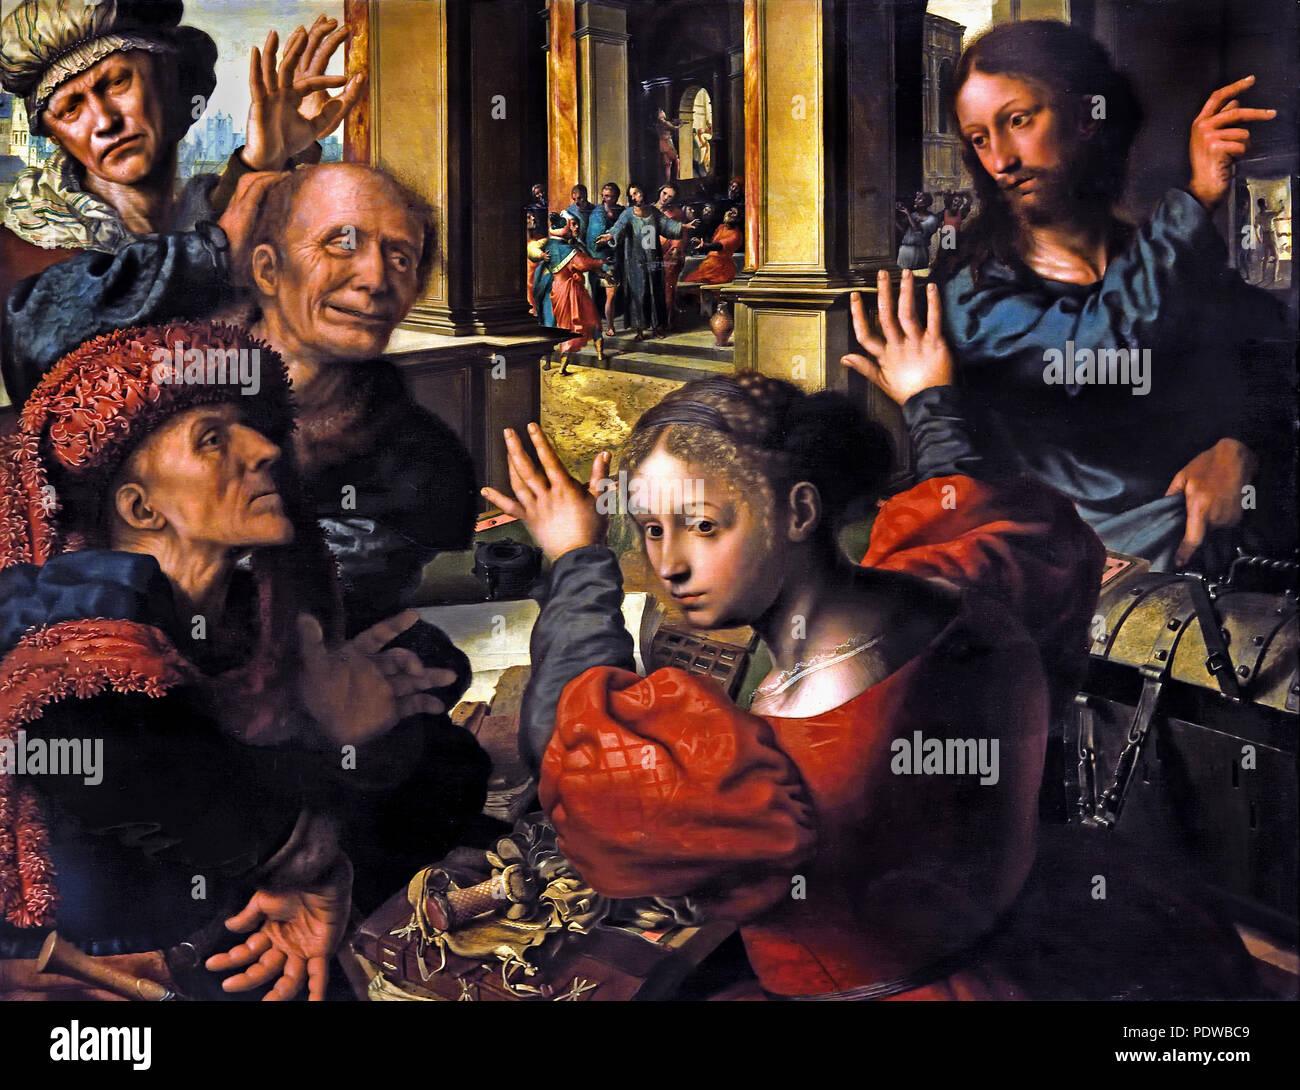 Appointment of the apostle Matthew 1539/1540  by Jan Sanders van Hemessen ( 1500 Antwerpen - 1563/66 Haarlem) Flemish, The, Netherlands, Dutch, - Stock Image